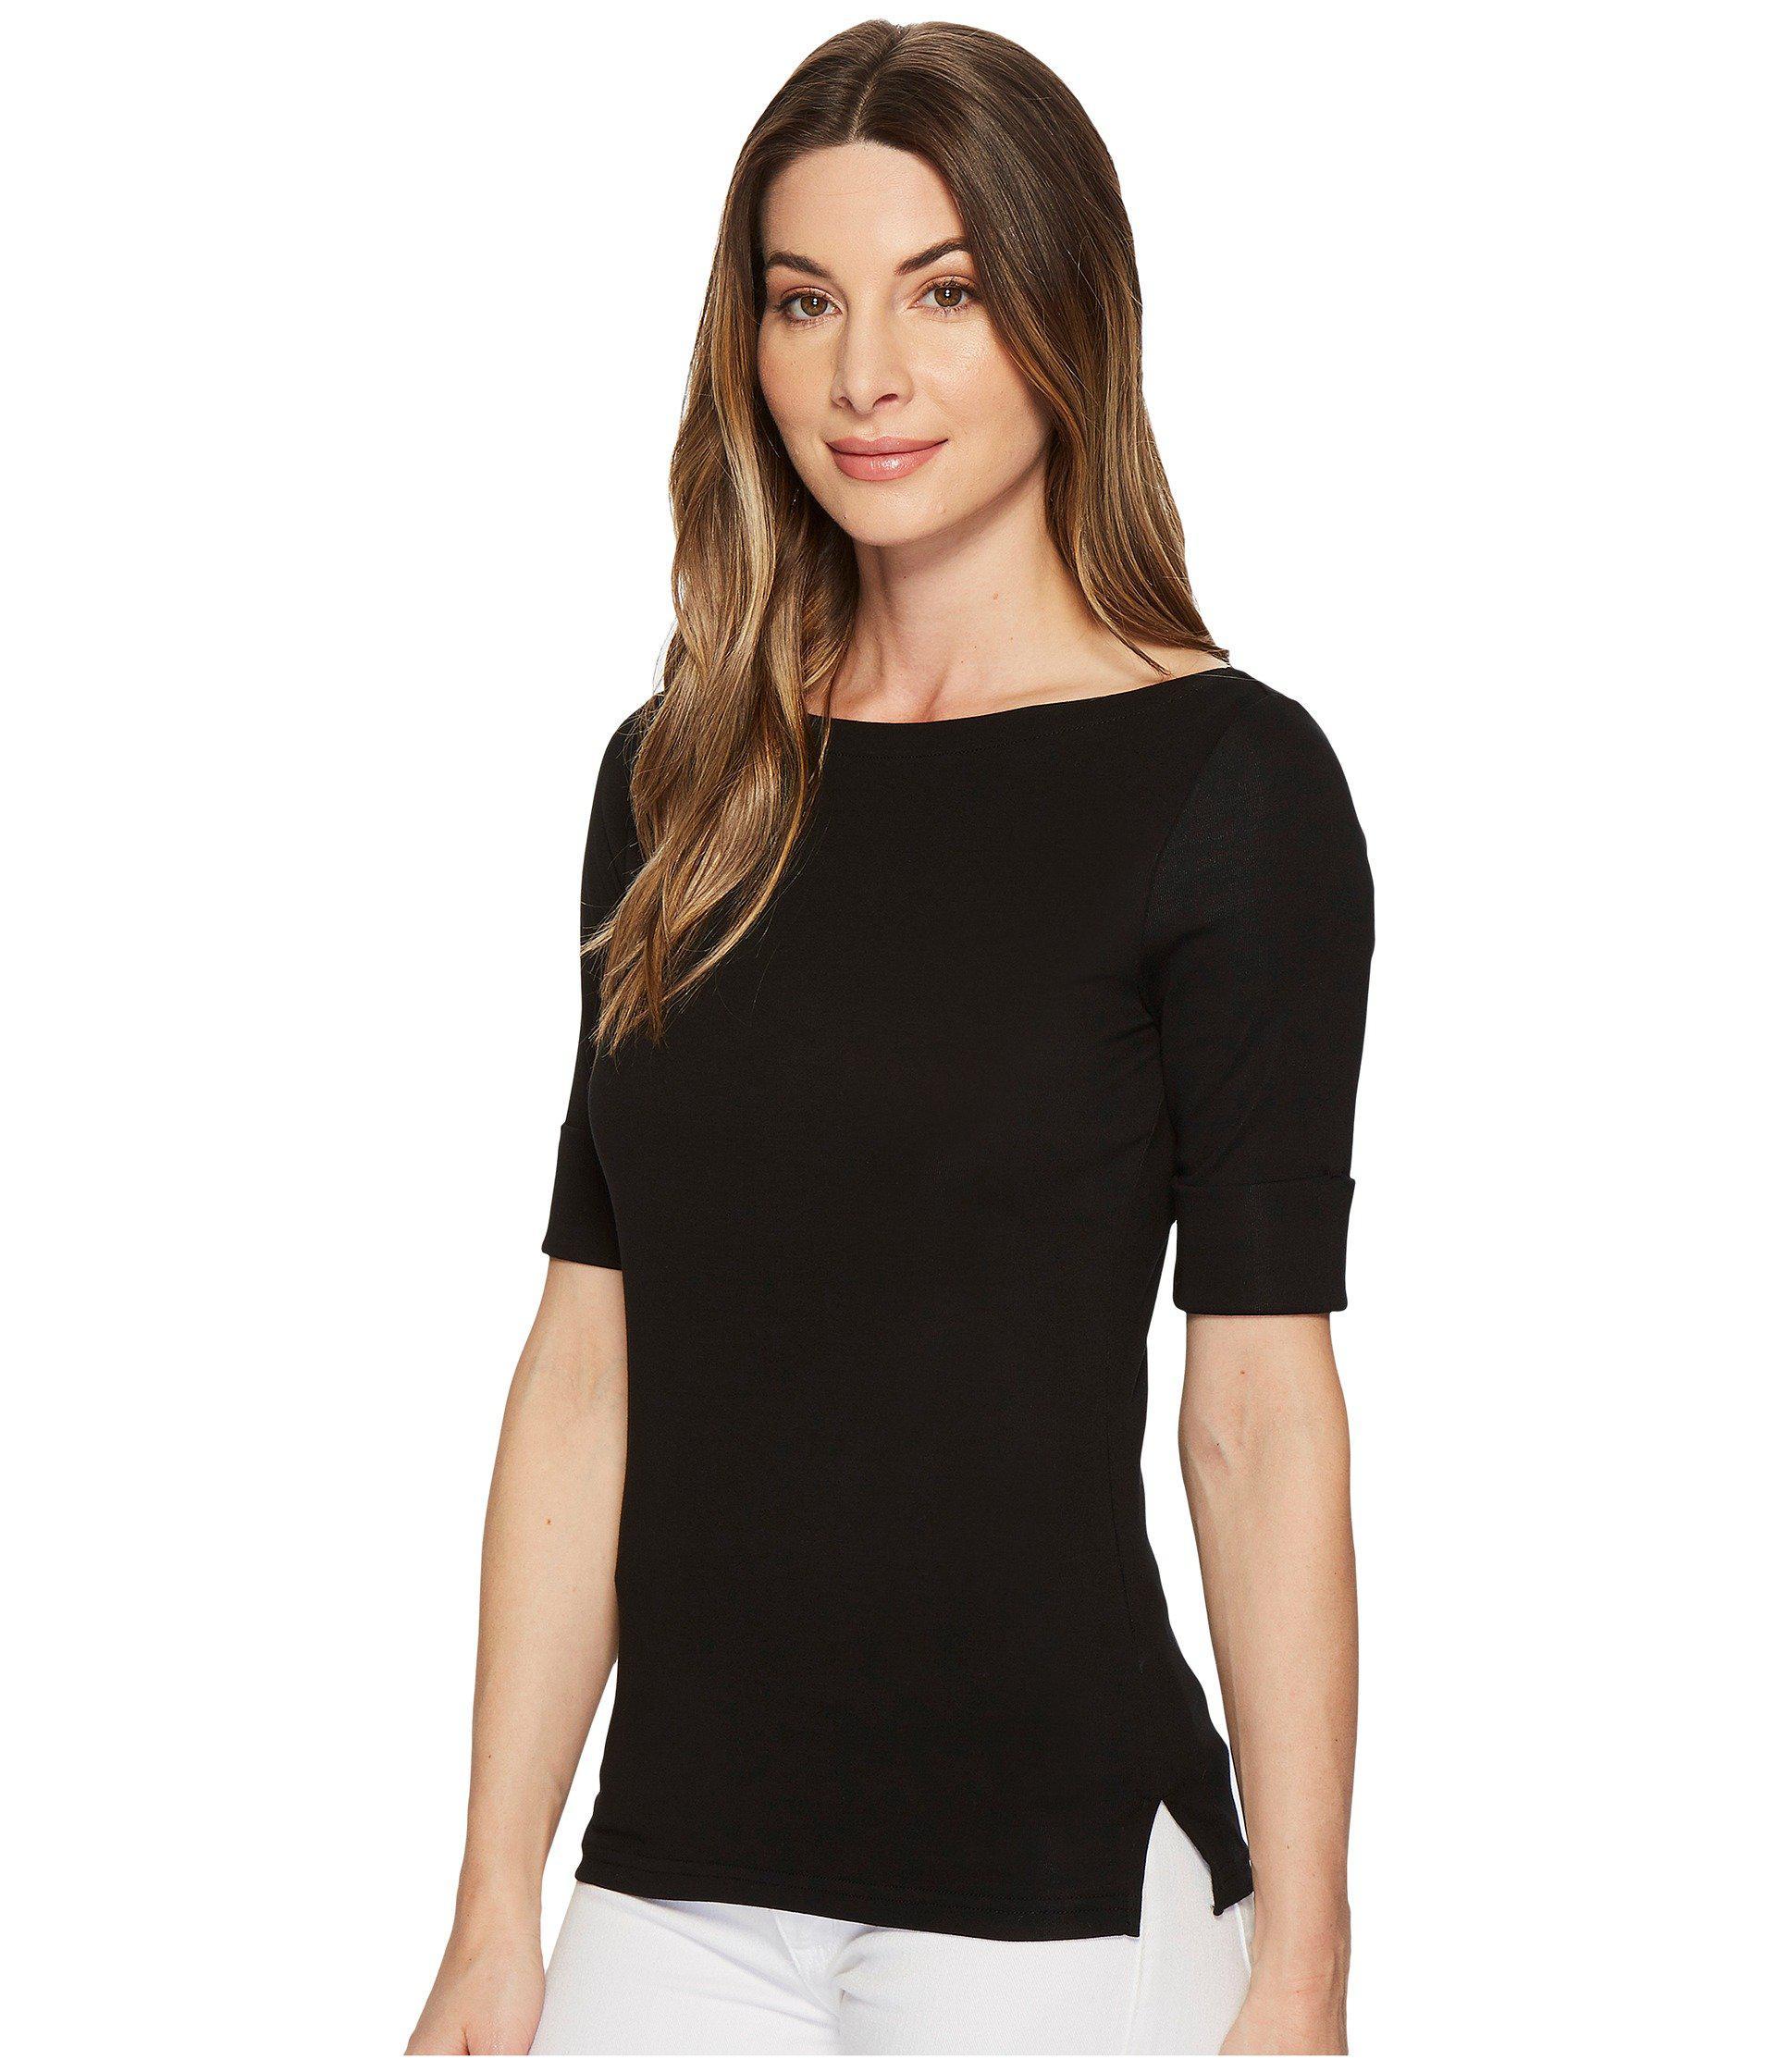 4a0398ff64d Lyst - Lauren by Ralph Lauren Stretch Cotton Boat Neck Tee (white) Women s  T Shirt in Black